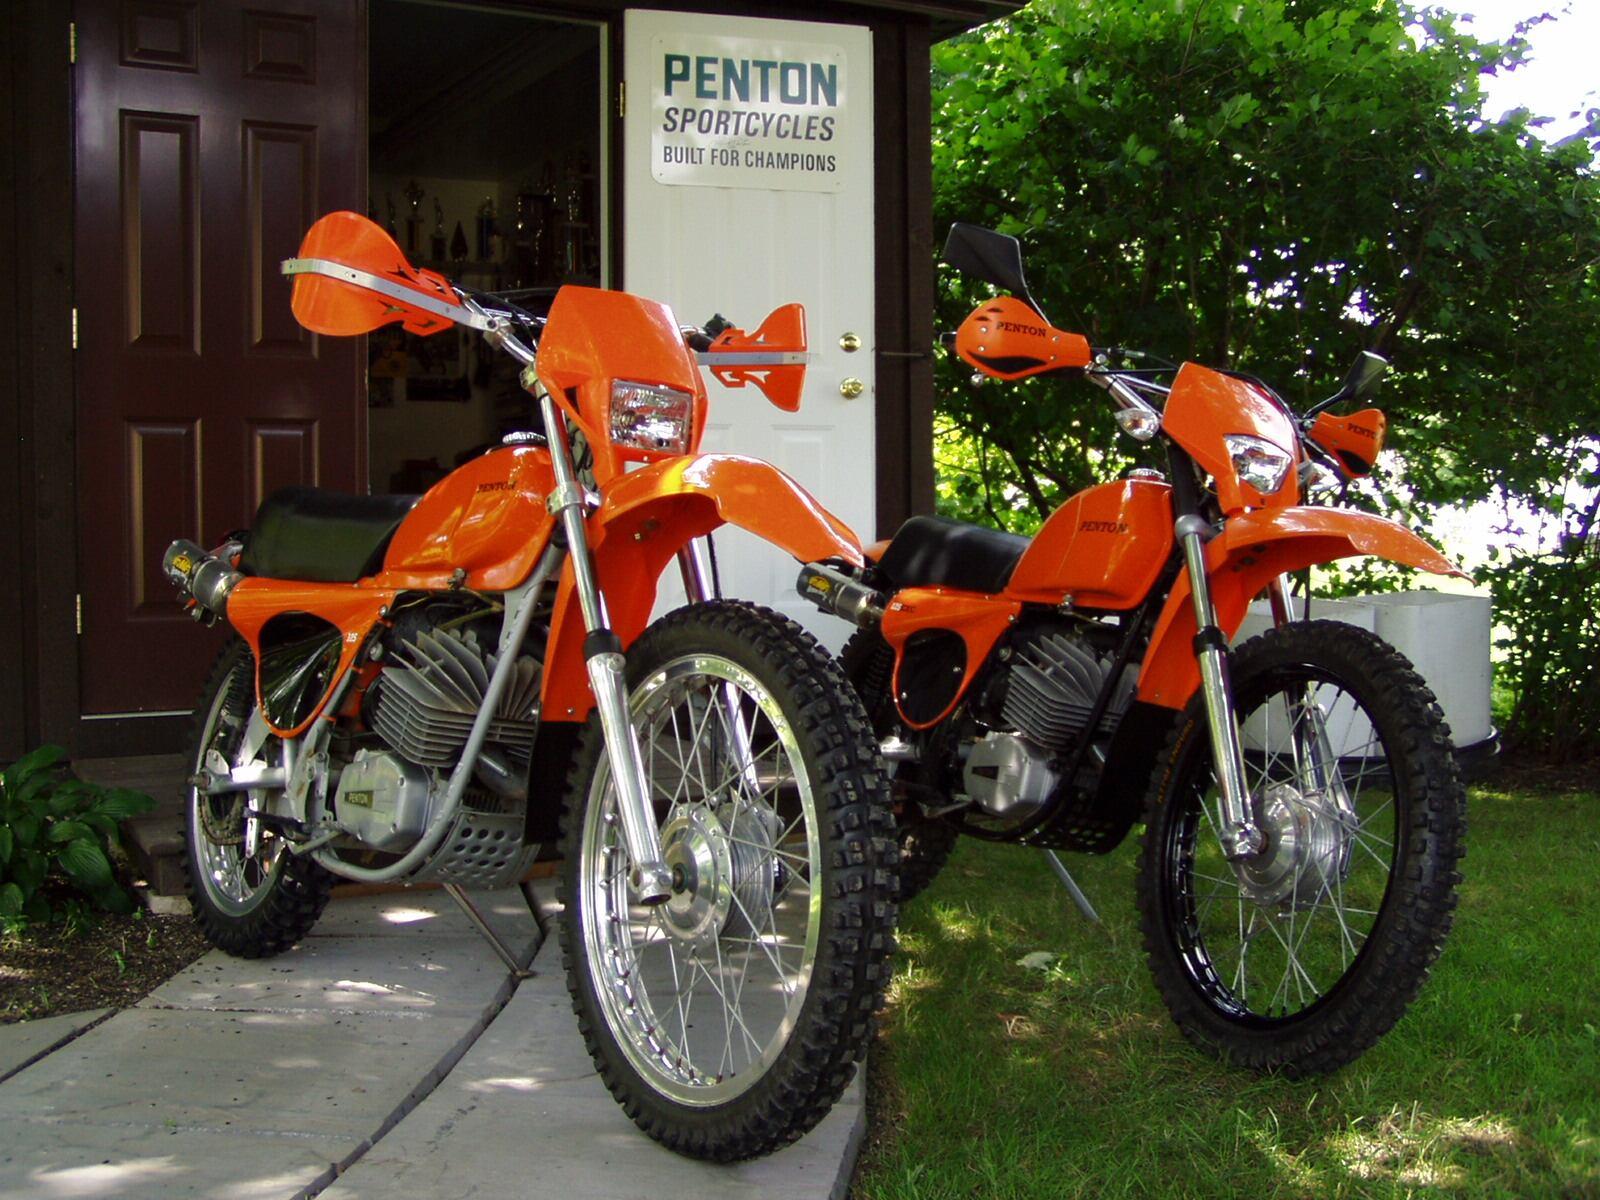 1972 - Penton, custom